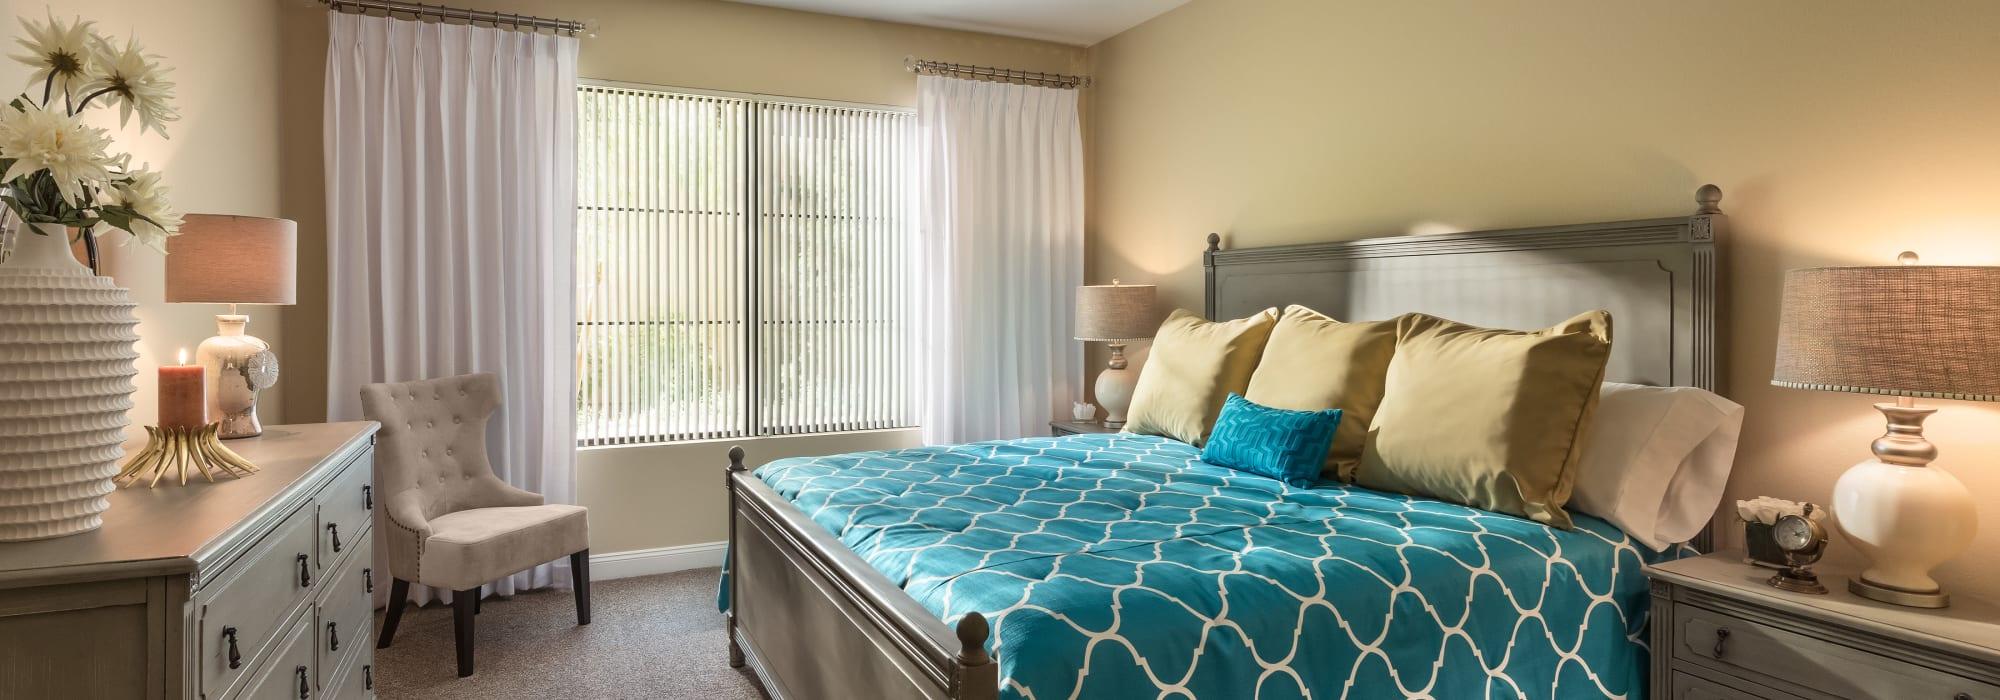 Luxury bedroom at San Portales in Scottsdale, Arizona